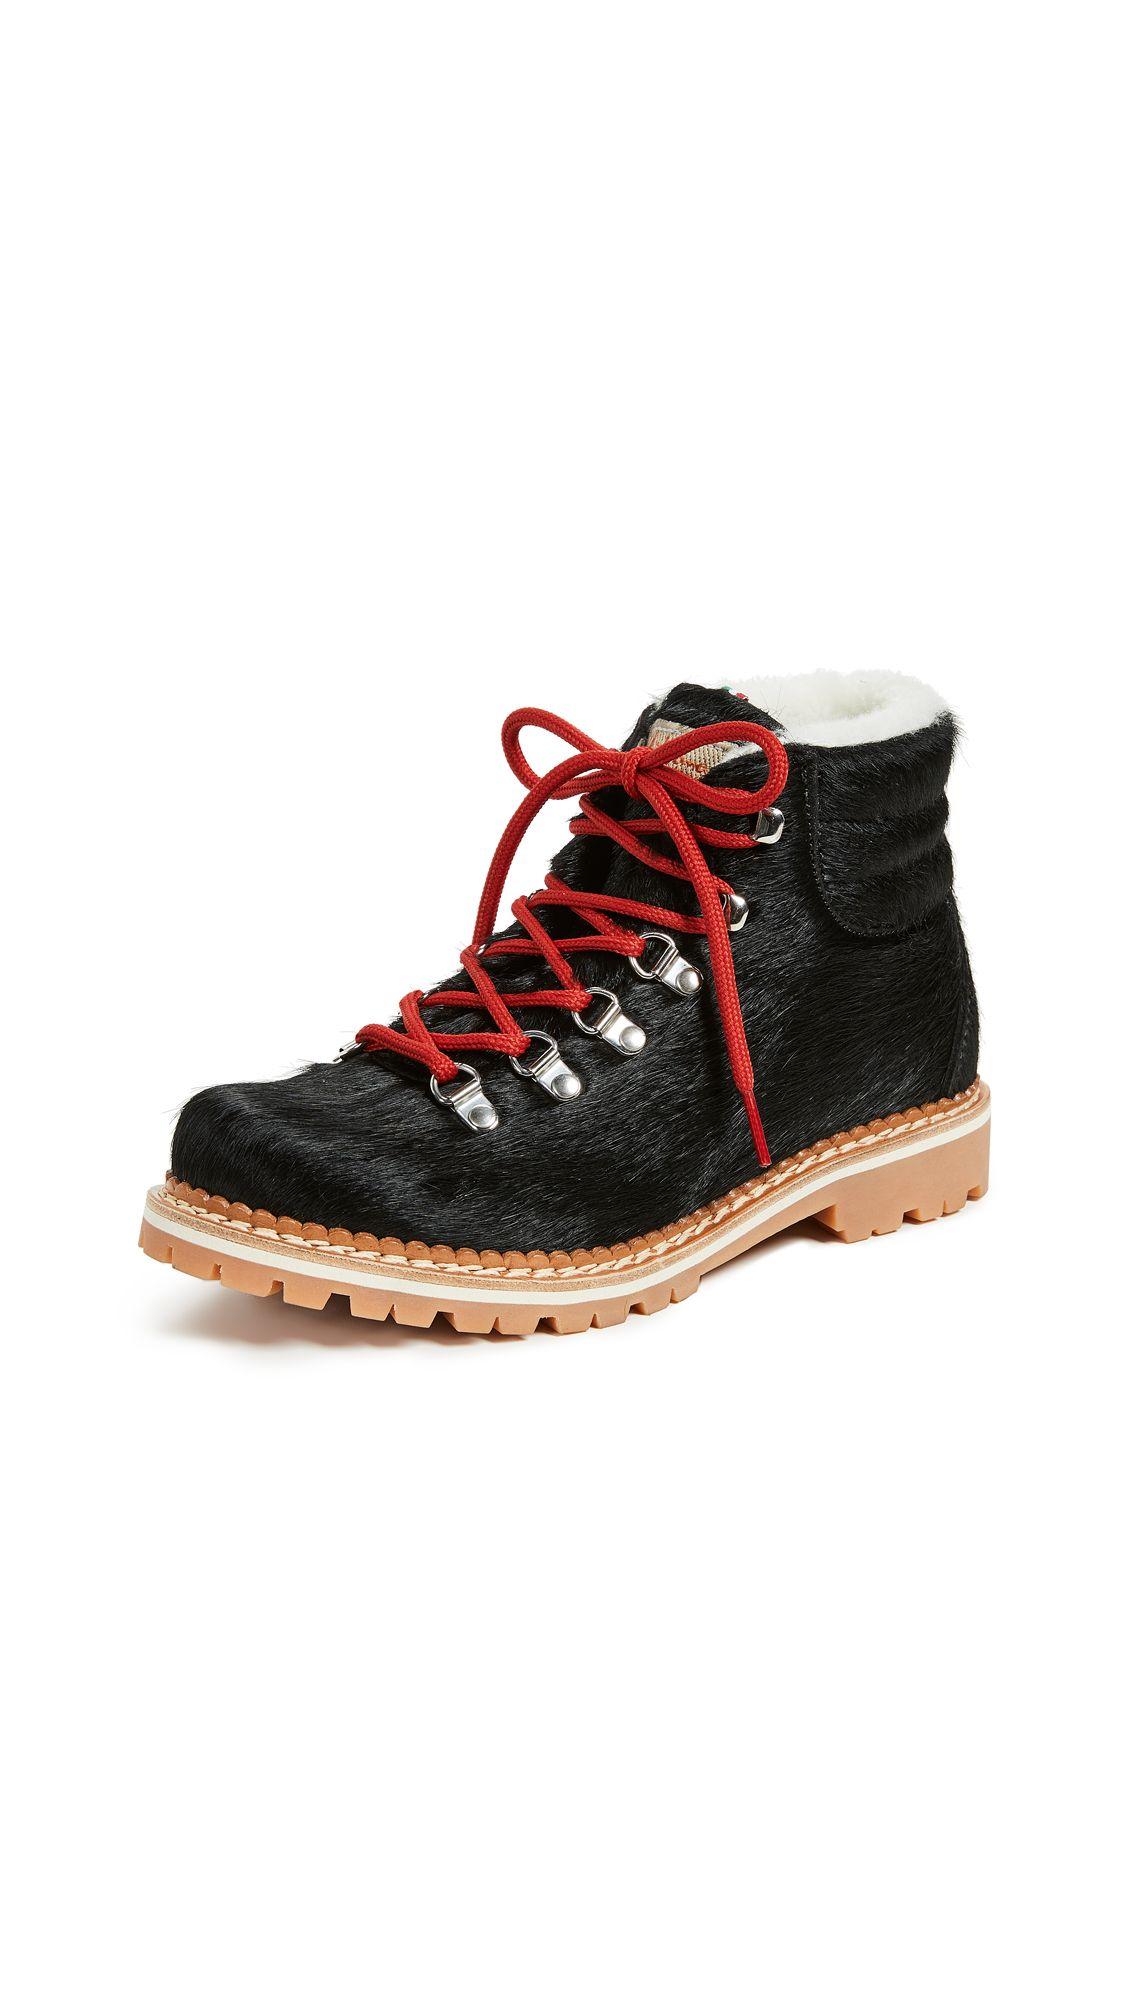 0b3a99a3689 MONTELLIANA Margherita Hiker Boots.  montelliana  shoes ...